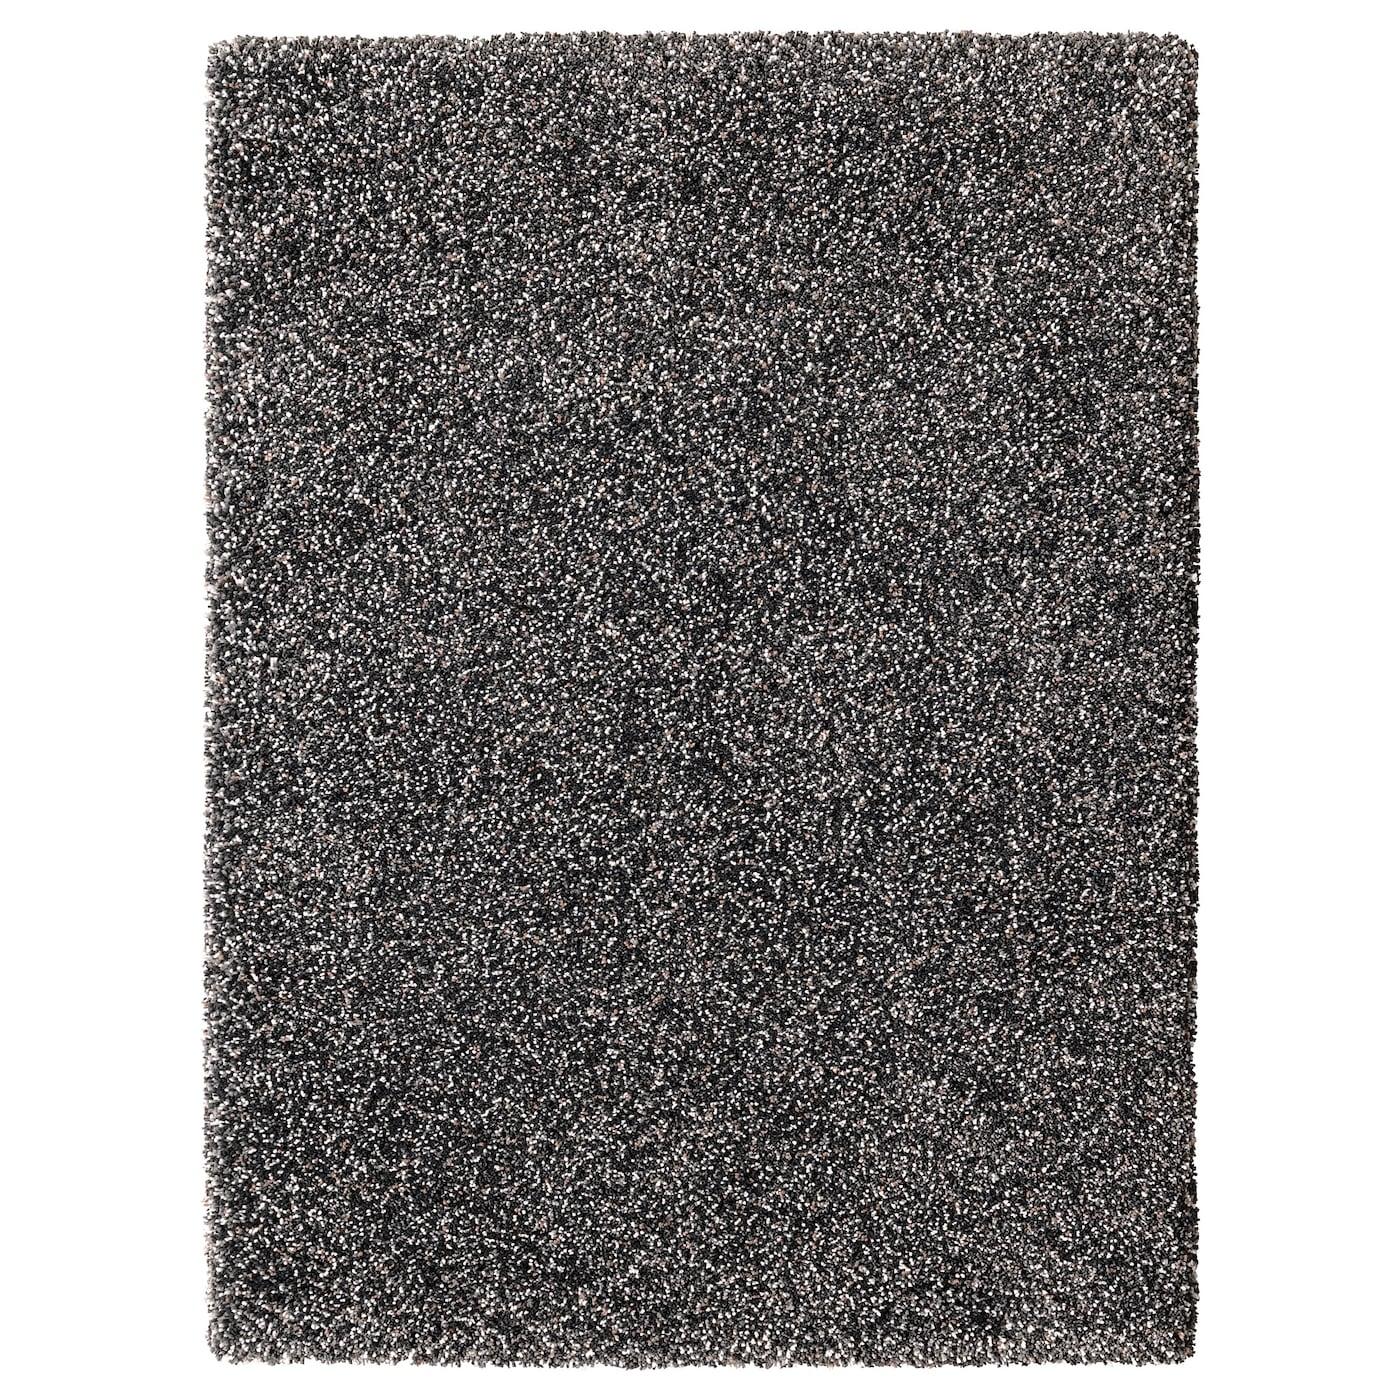 solidaster rideaux occultant 1 paire noir multicolore 145 x 300 cm ikea. Black Bedroom Furniture Sets. Home Design Ideas